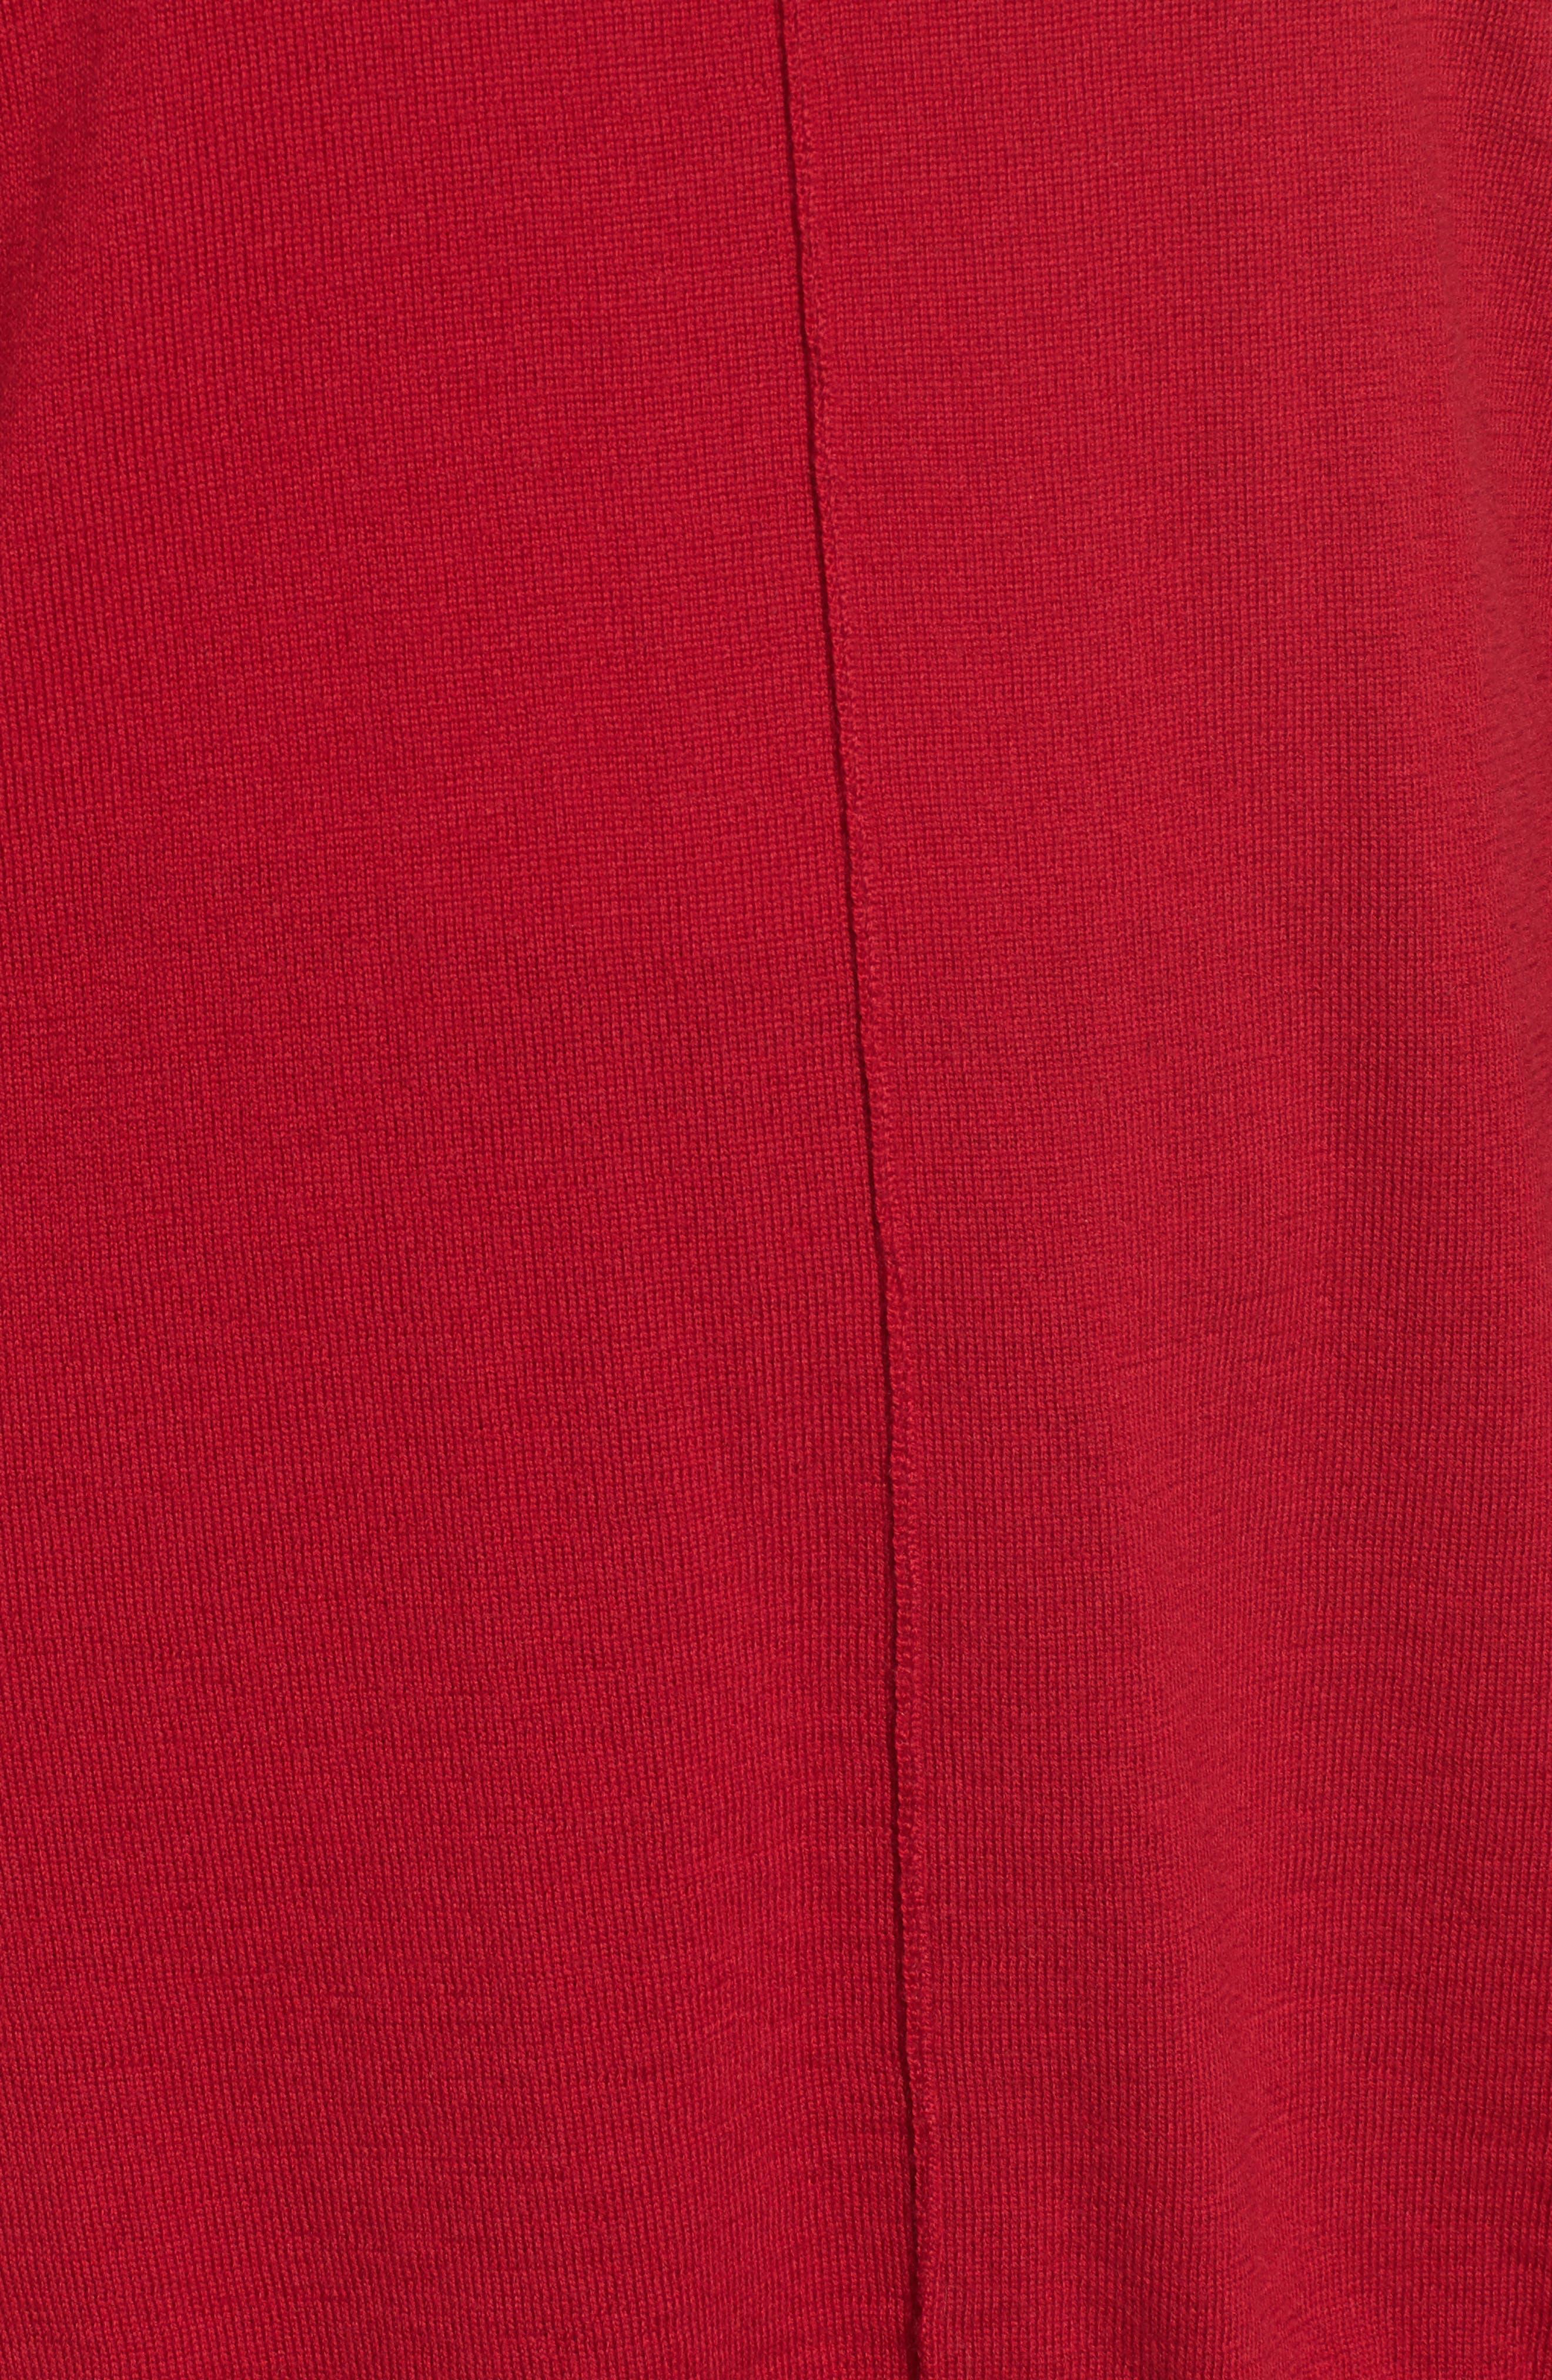 Alternate Image 5  - Eileen Fisher Merino Wool Boxy Turtleneck Sweater (Regular & Petite)